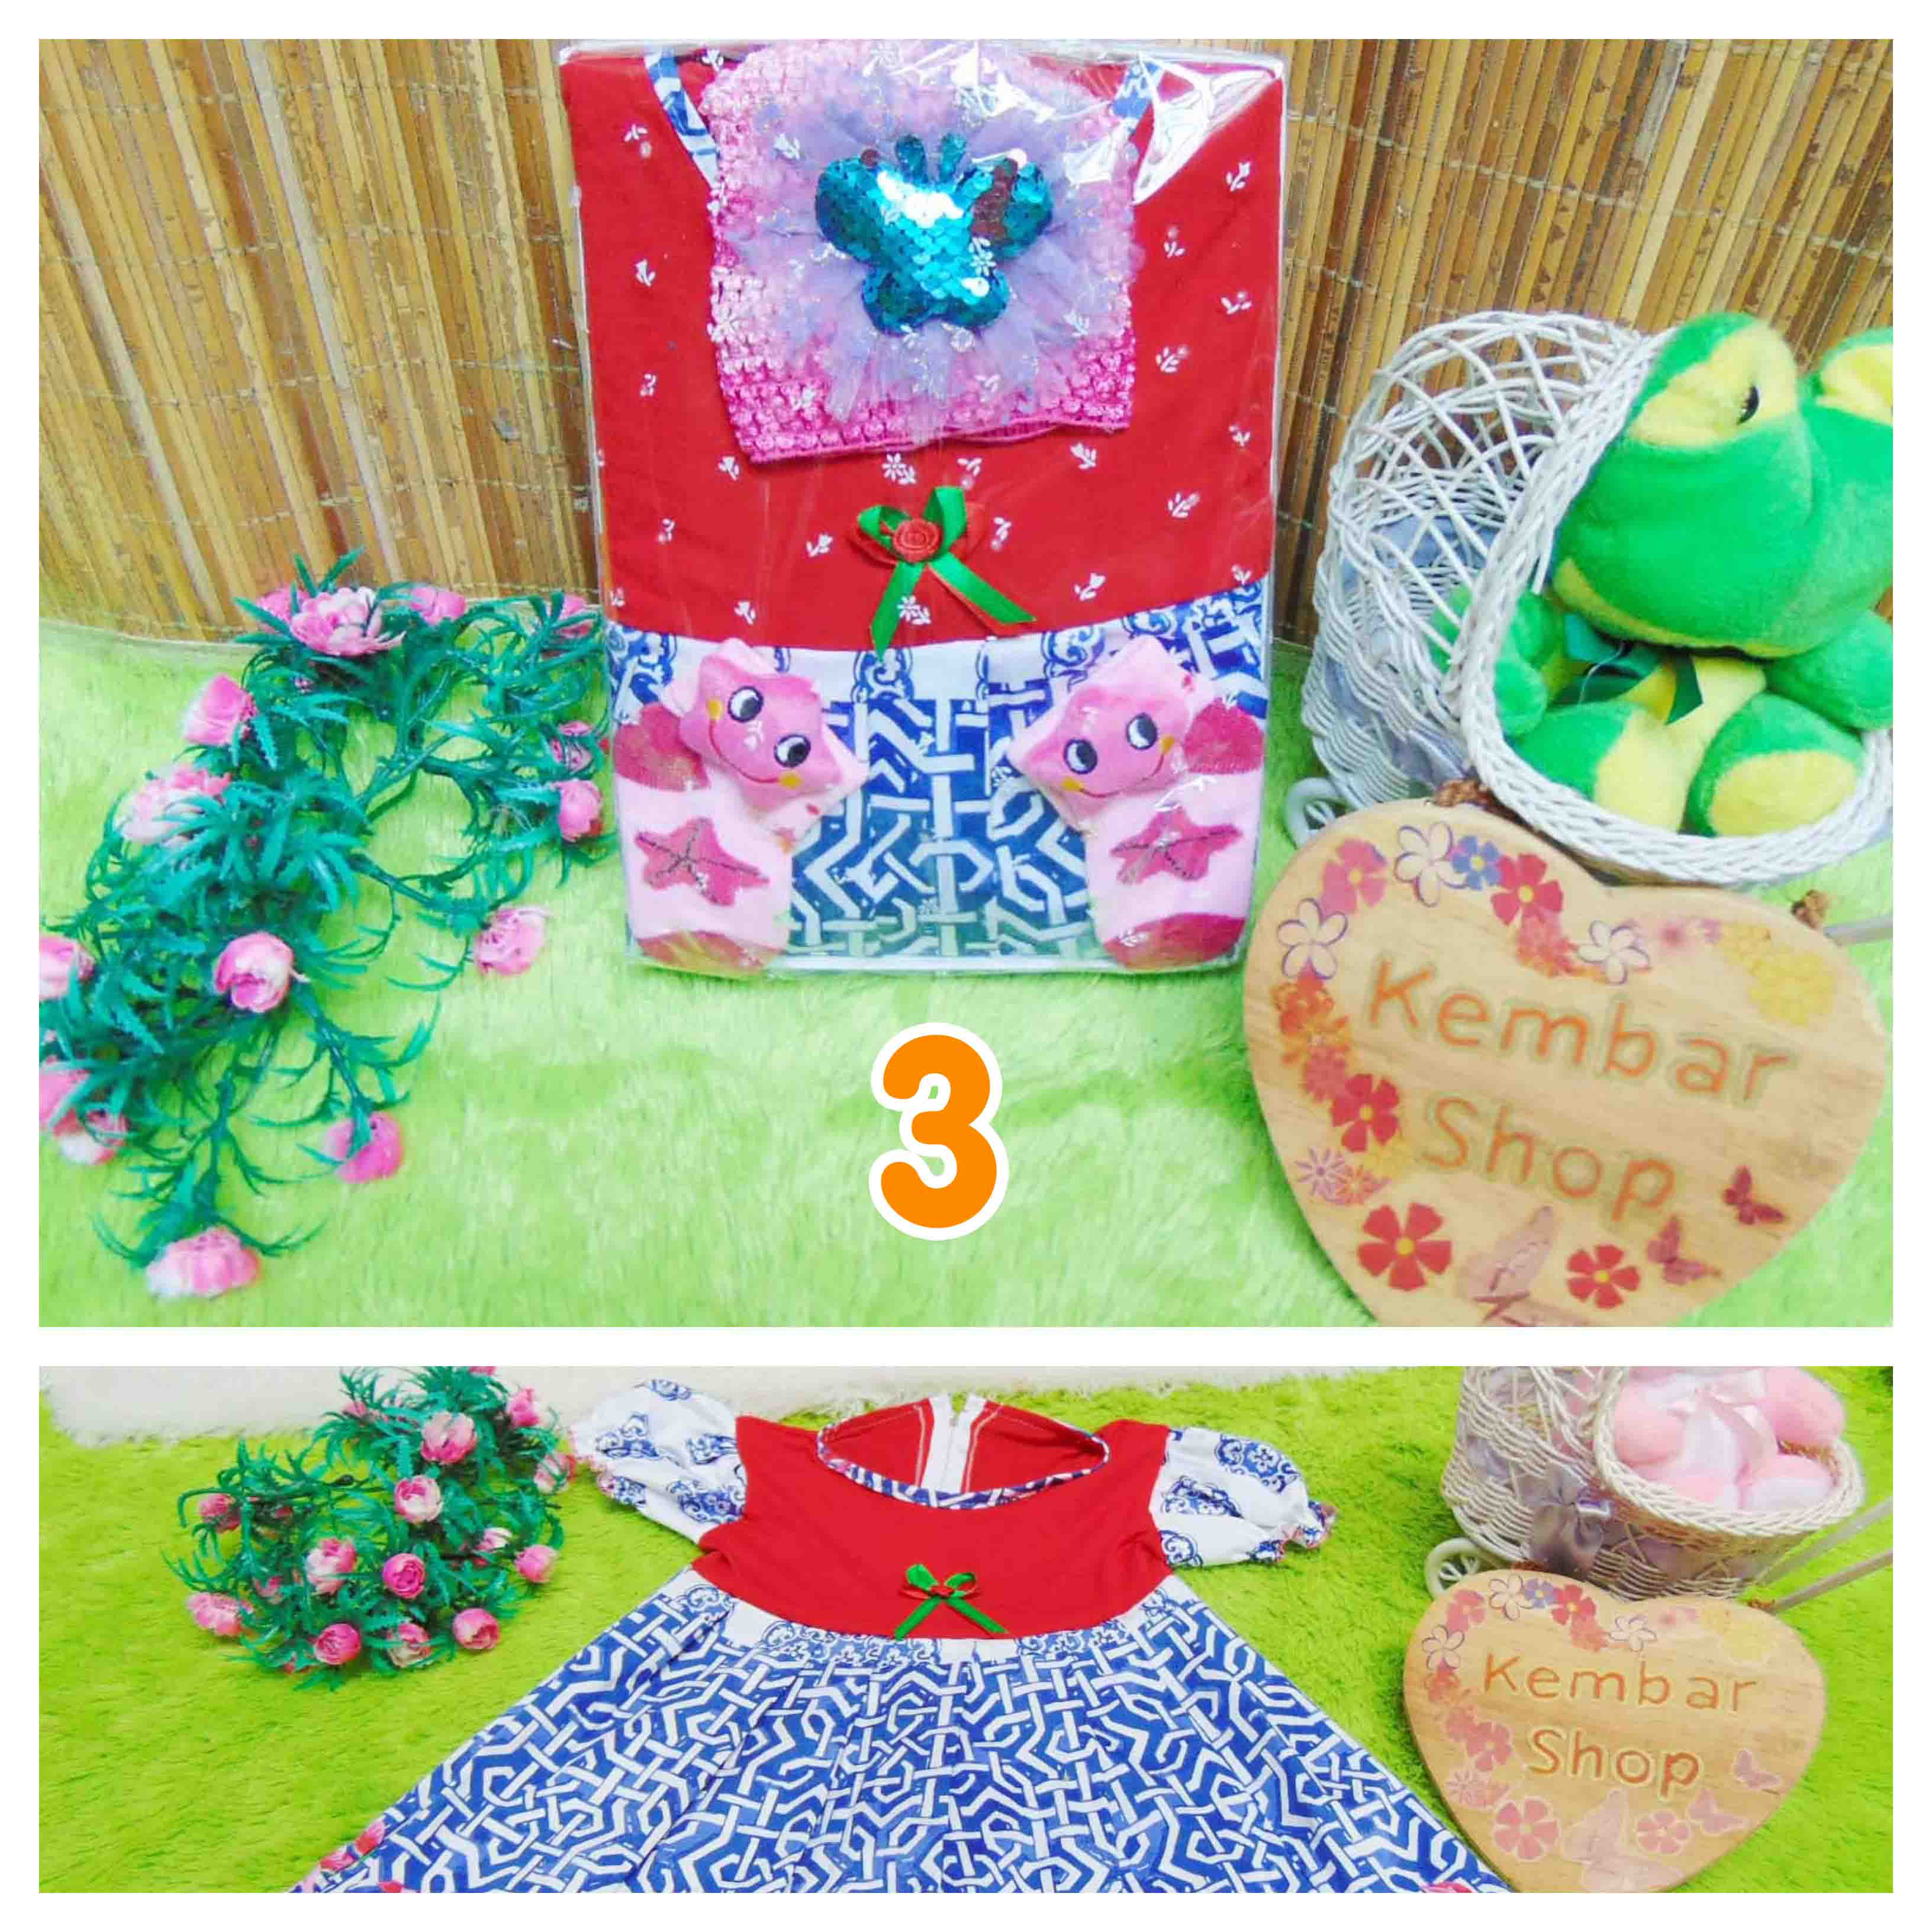 FREE KARTU UCAPAN Kado Lahiran Box Paket Kado Ulang Tahun Anak Bayi Perempuan Cewek Baby Gift Dress BELLA Sock turban RANDOM Warna (3)